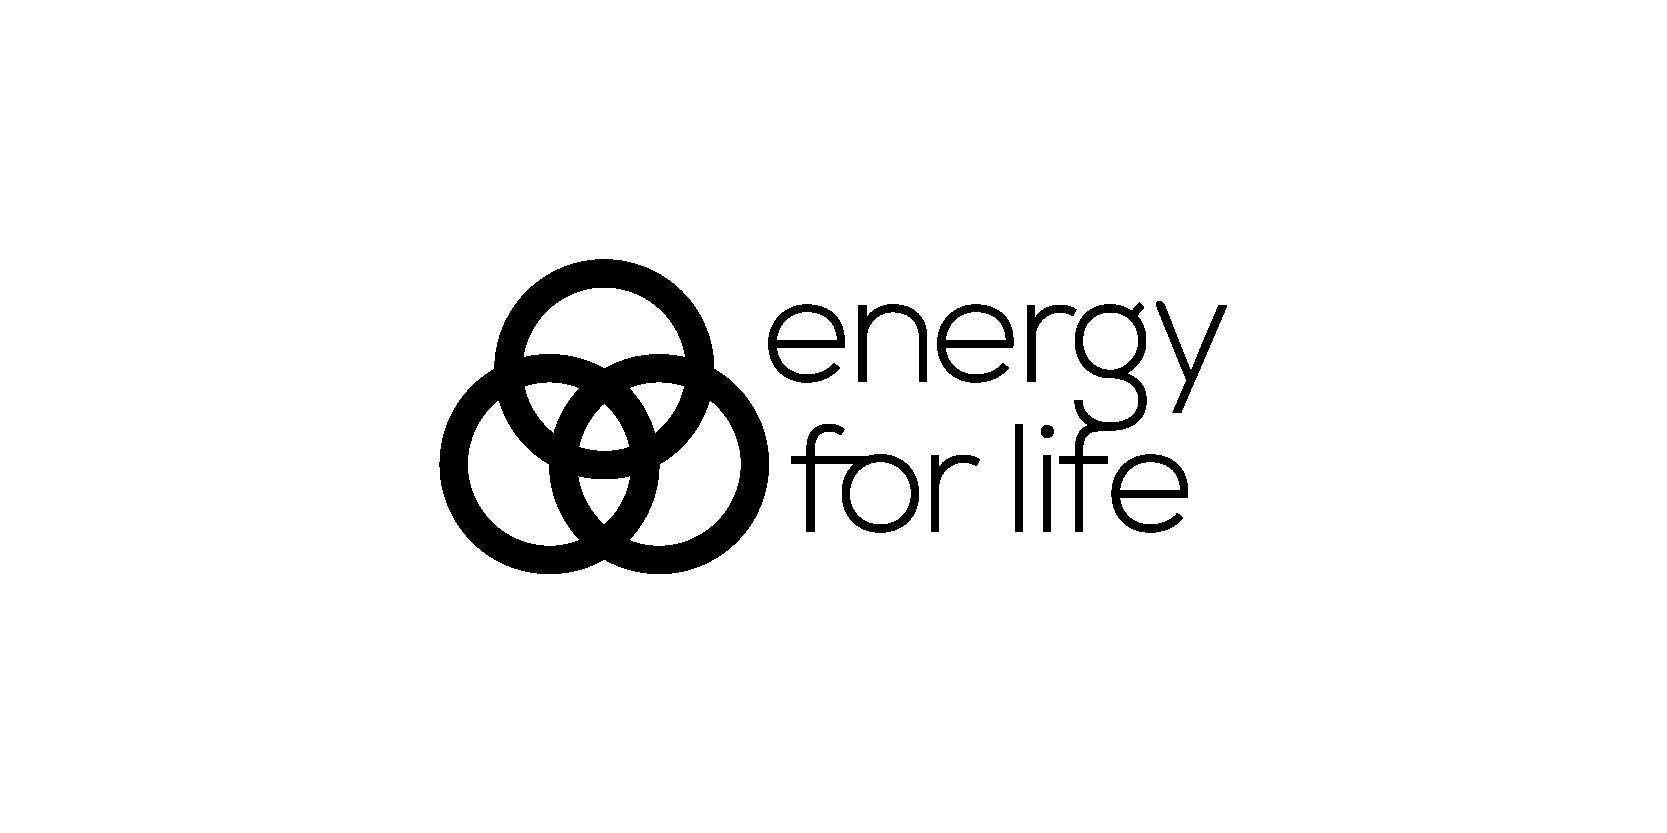 EnergyForLife-Hori-Mono.png